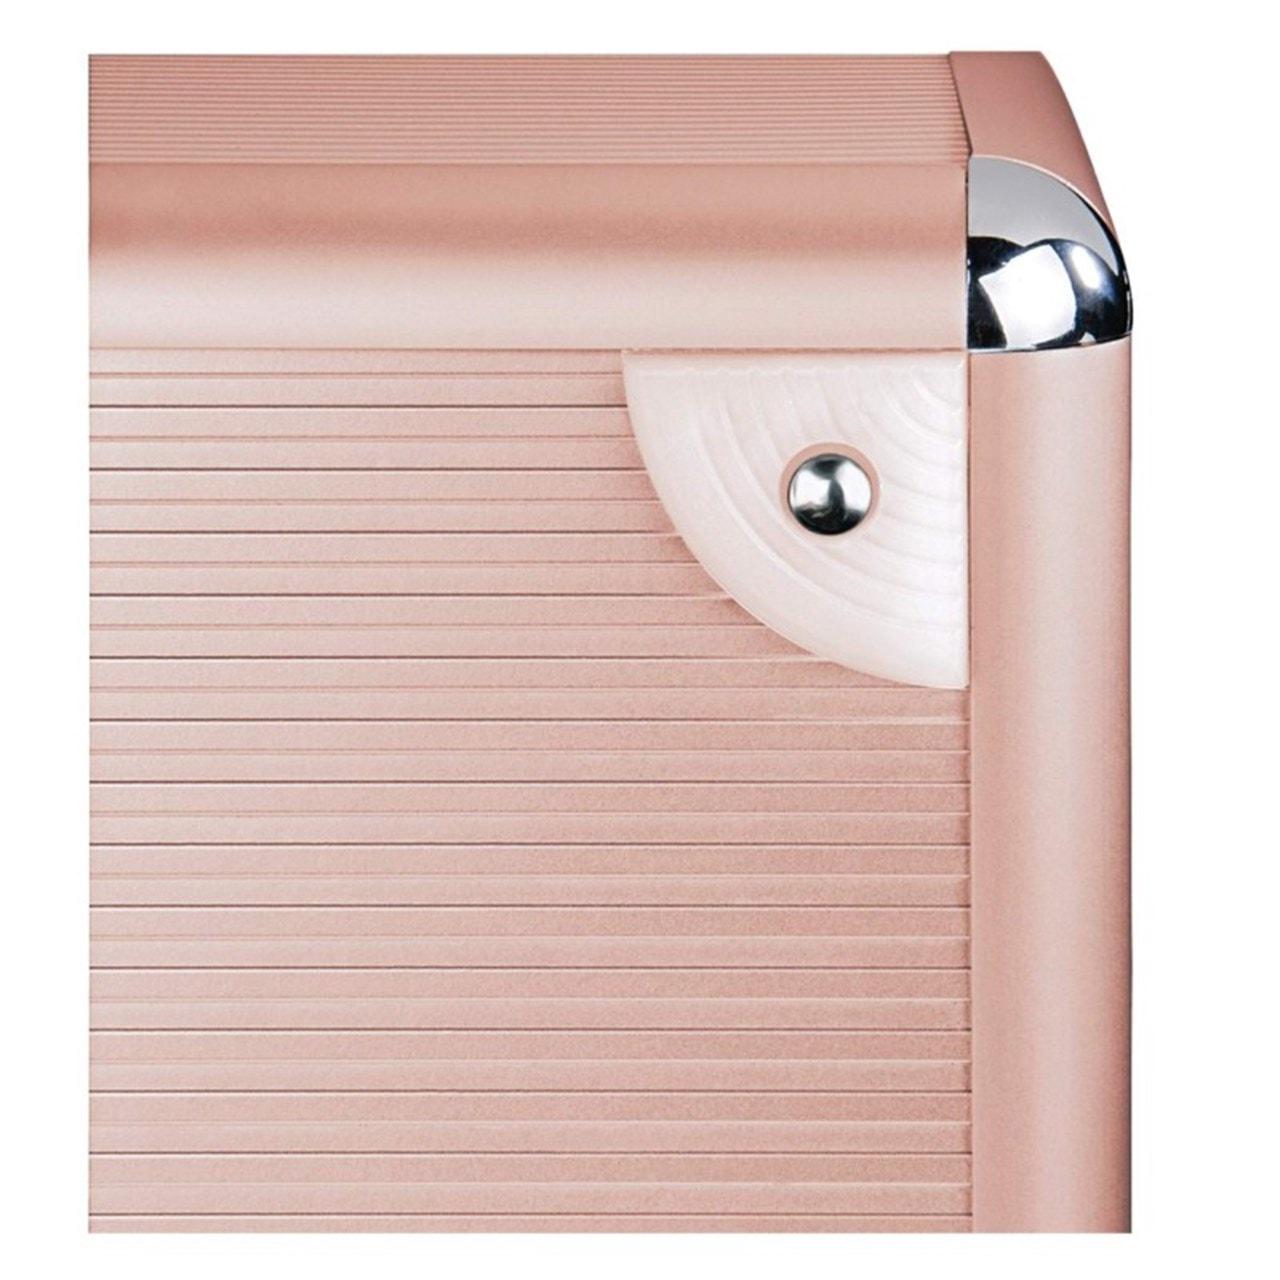 Hama Rose Gold Case for LP Storage - 4